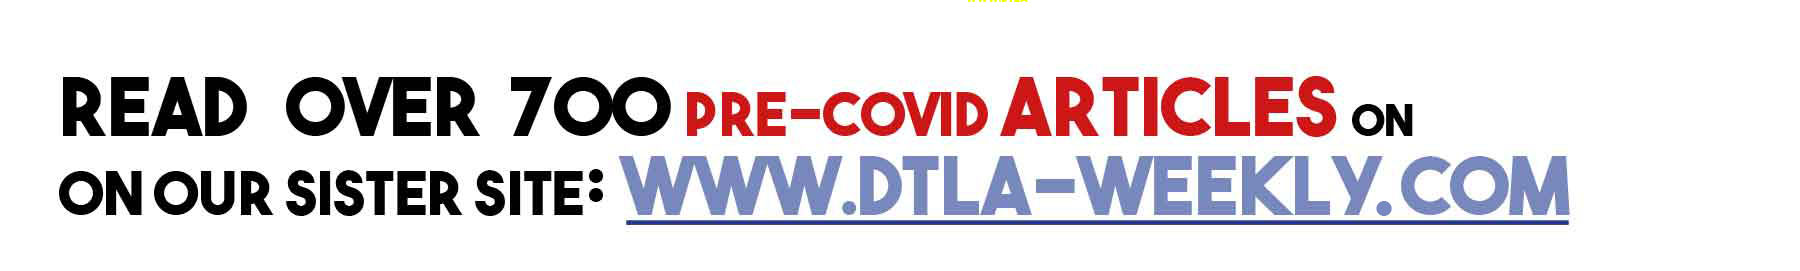 DTLA Weekly banner